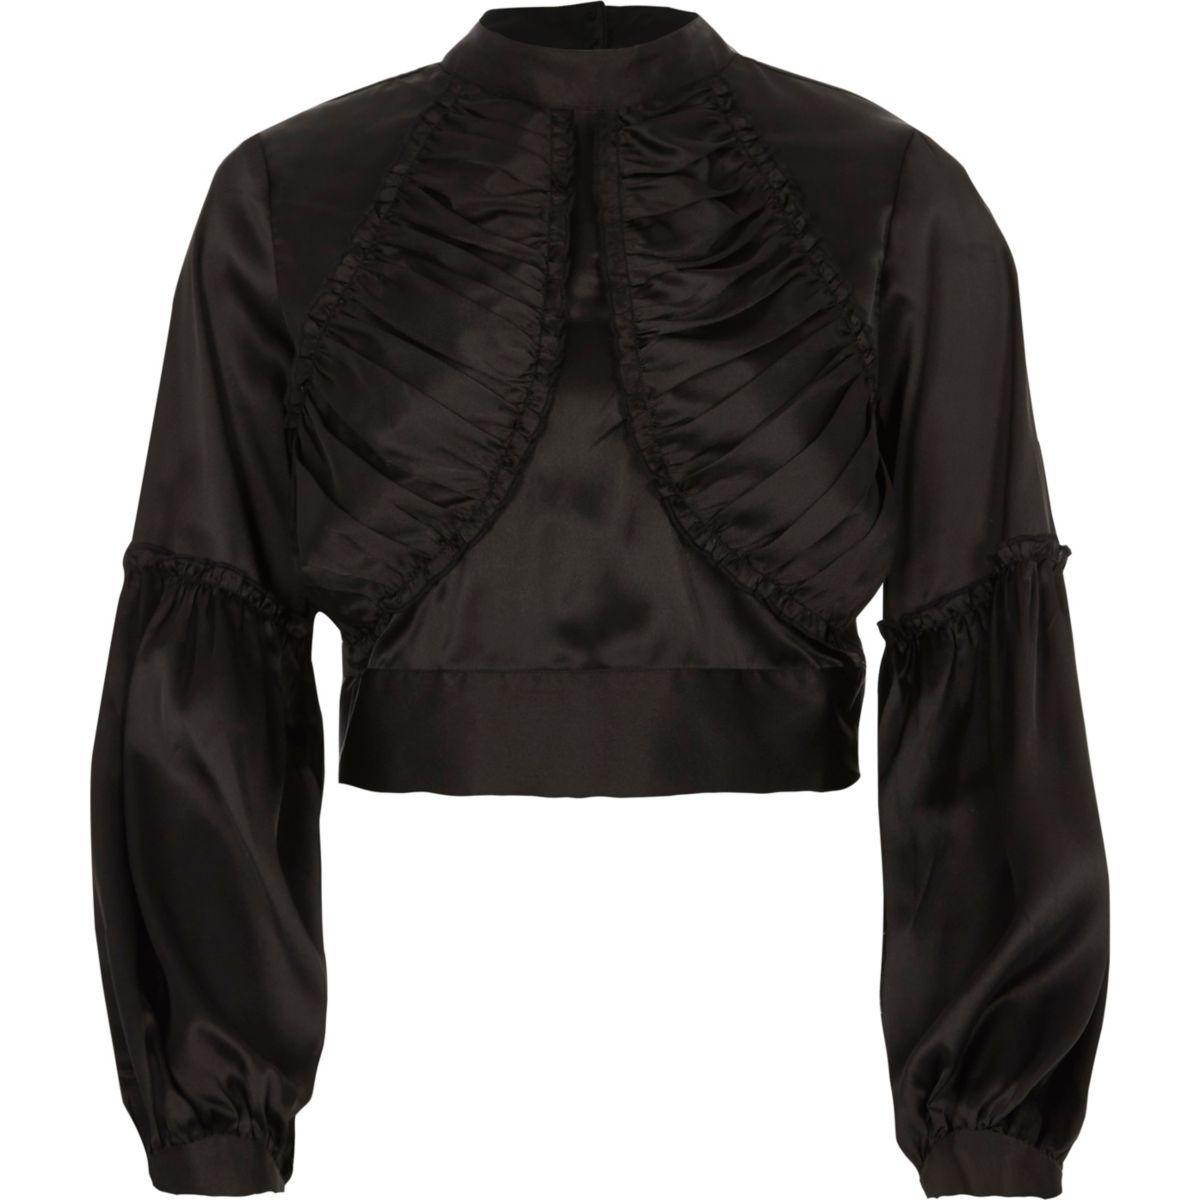 Black satin ruffle front high neck crop top